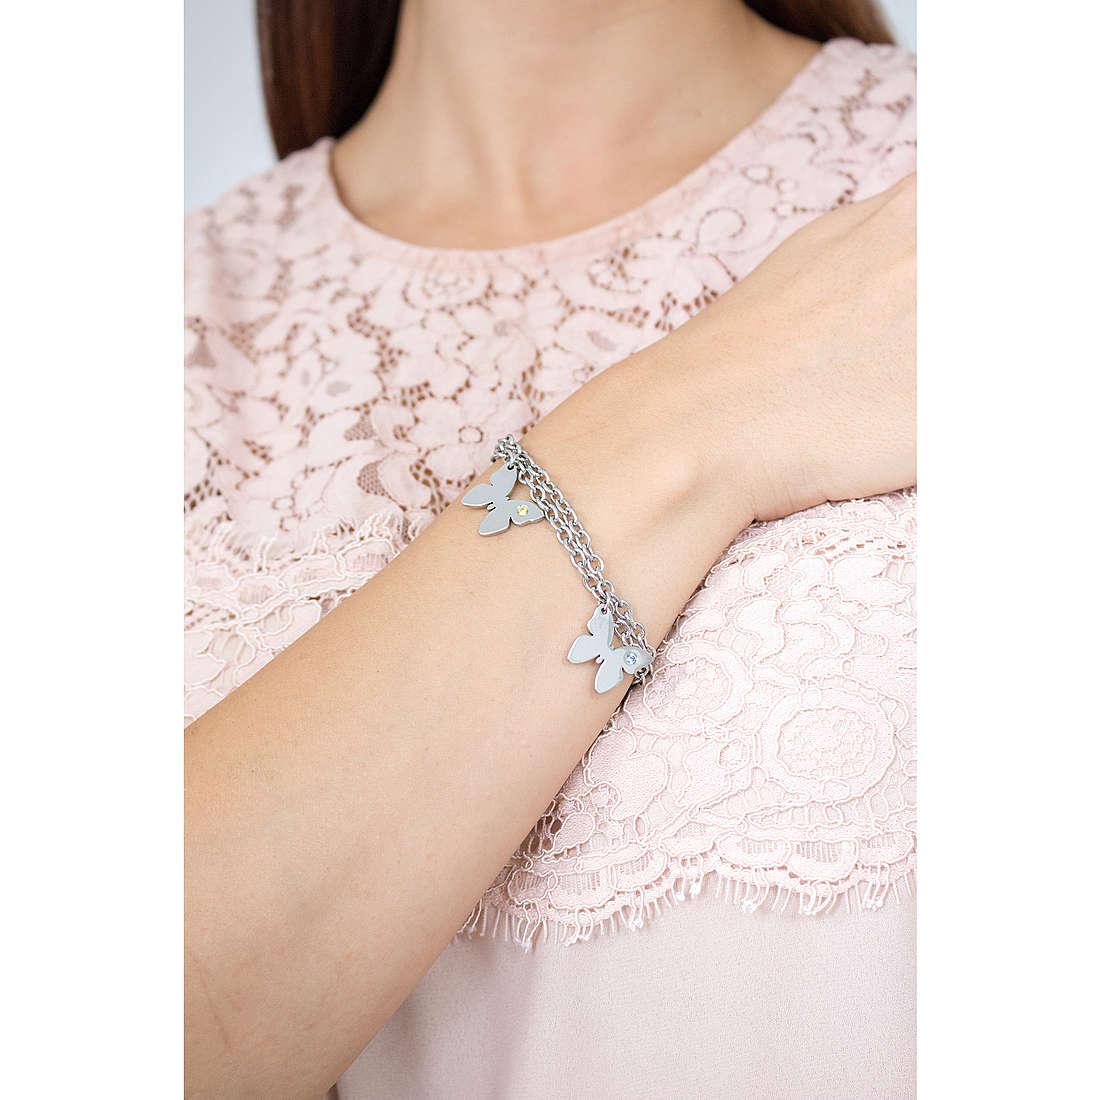 Nomination bracciali Butterfly donna 021316/016 indosso